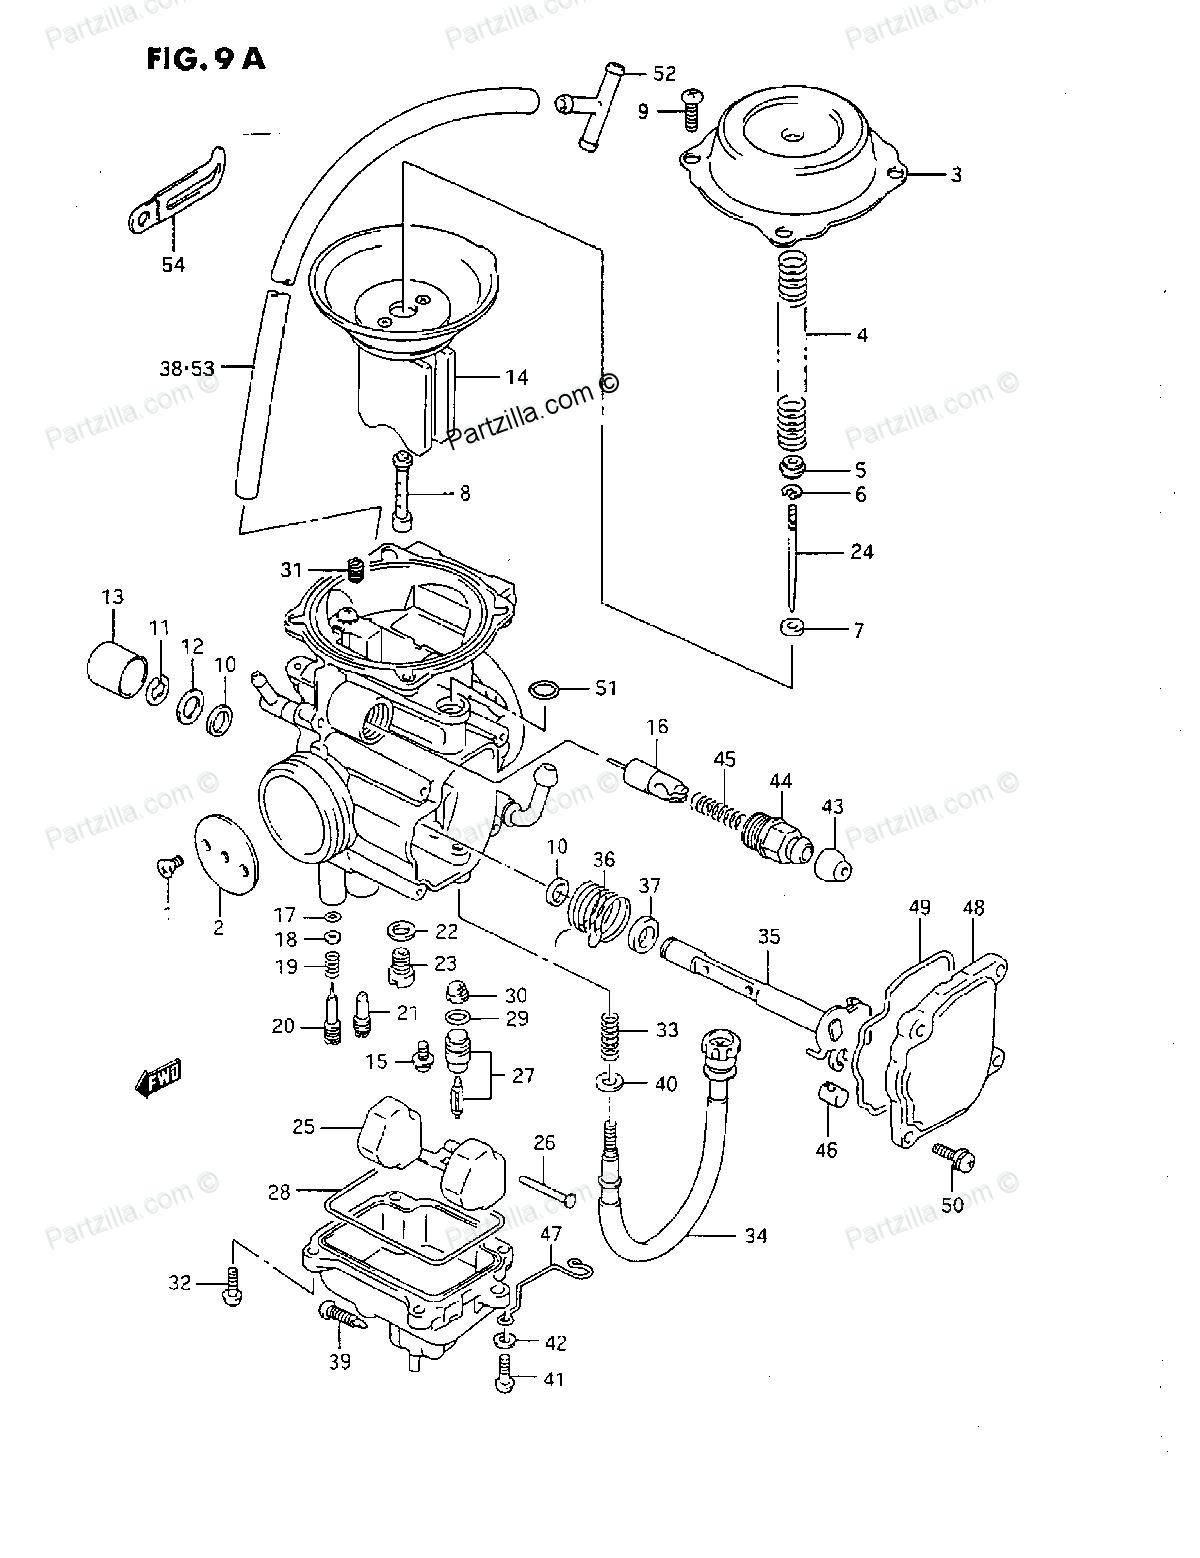 honda cbr600rr wiring diagram with 2011 Crf250r Wiring Diagram Wiring Diagrams on 600rr Wiring Horn likewise 929rr Wiring Diagram besides 1993 Honda Cbr 600 Wiring Diagram furthermore Jcb 165 Wiring Diagram in addition 108653 954 No Fuel Pump No Lights.